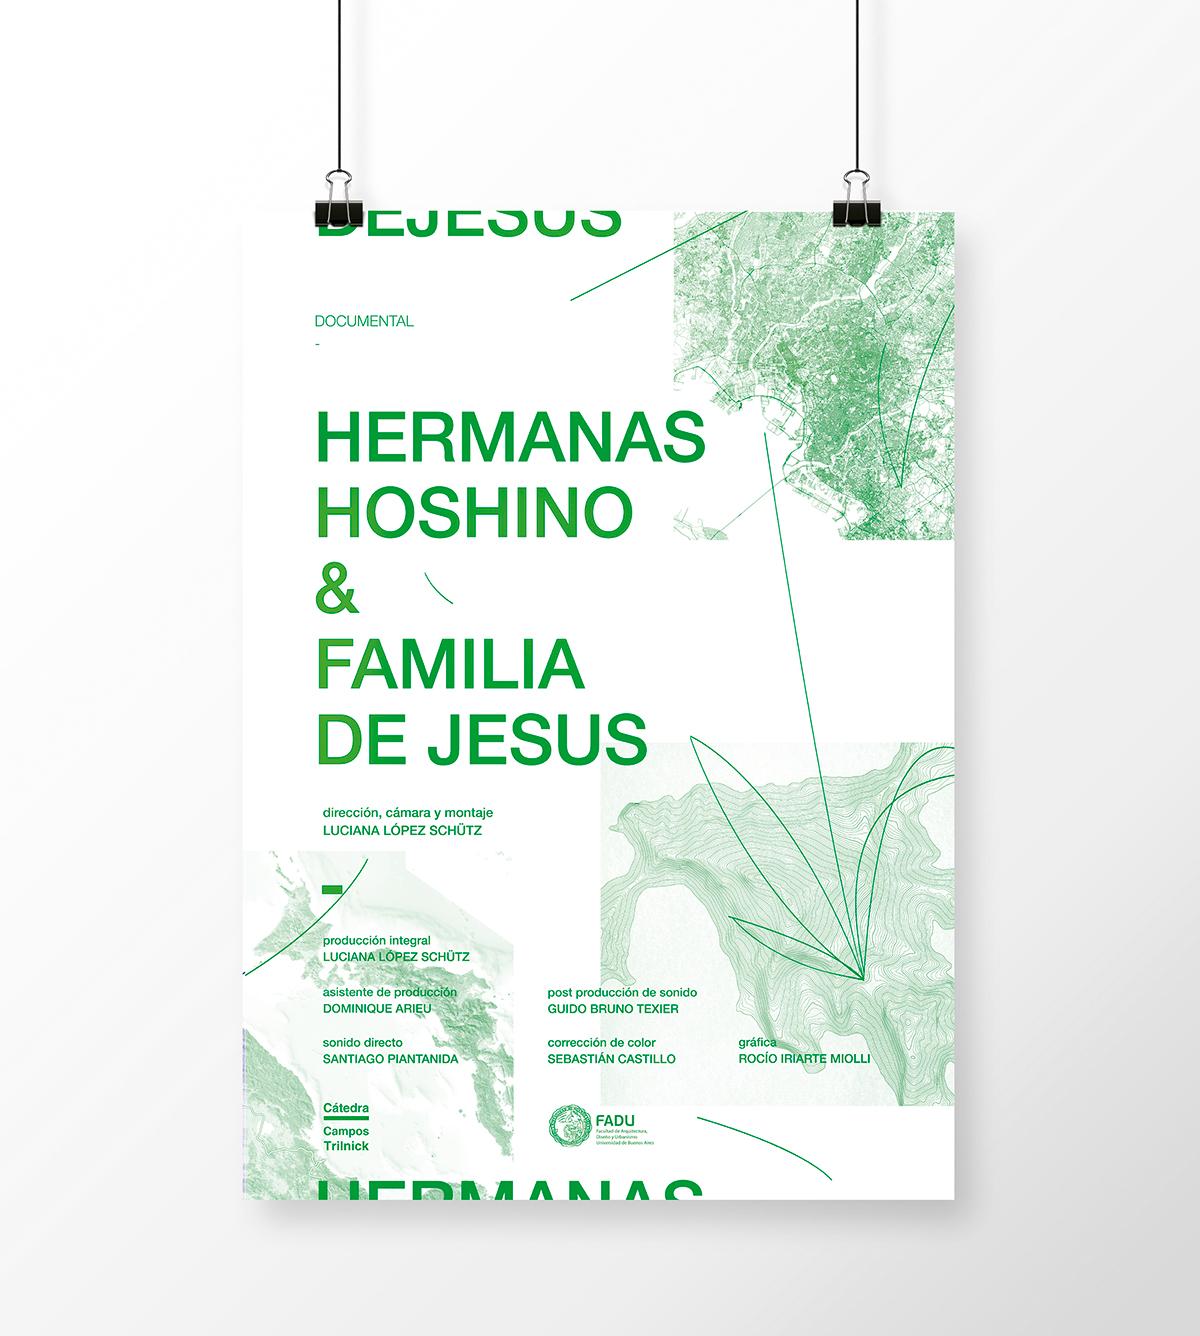 Hermanas Hoshino y Familia De Jesus — Poster on Student Show